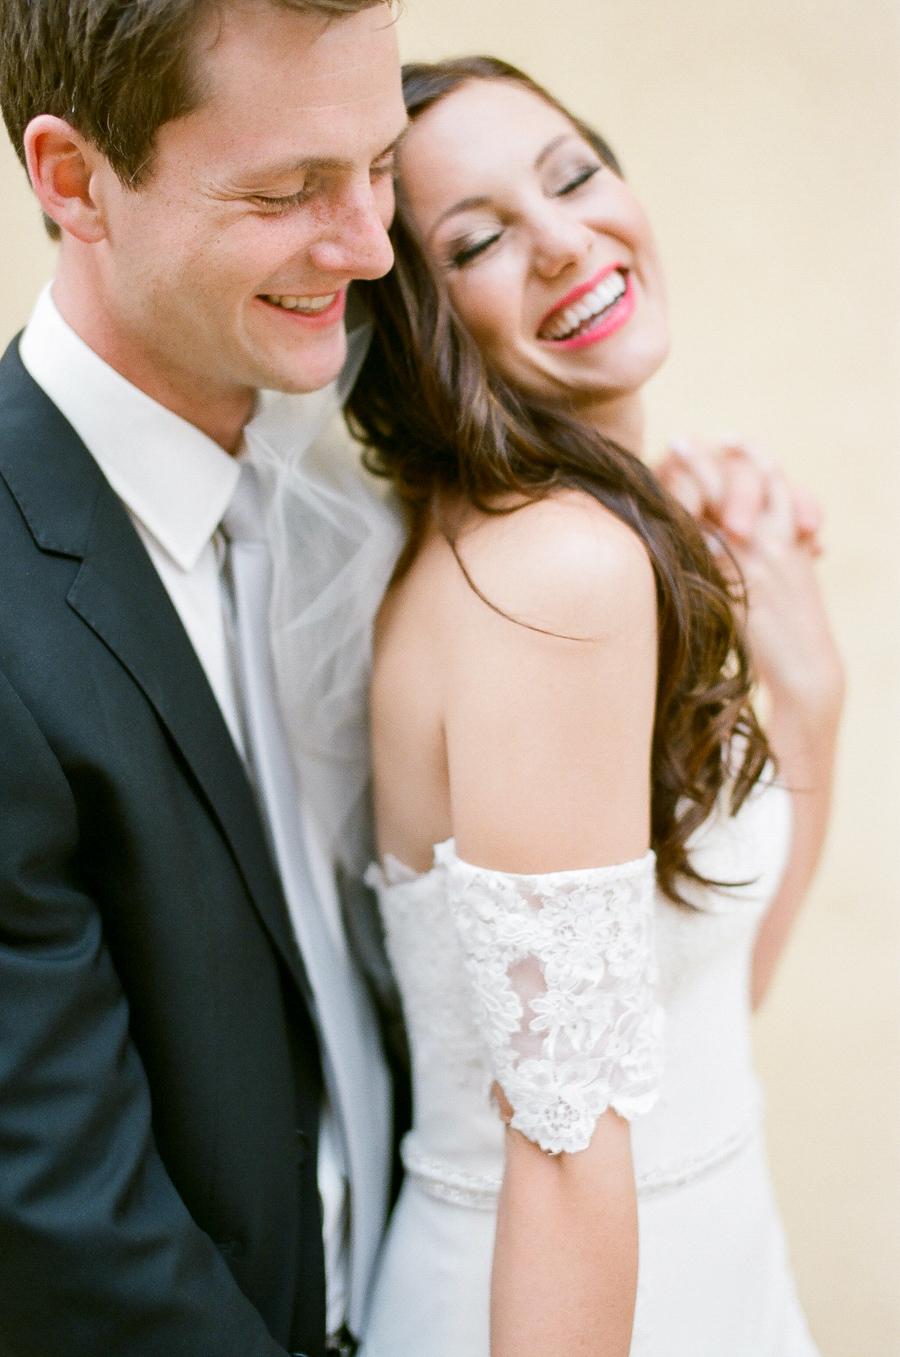 laemmlen-wedding-blog-11.jpg